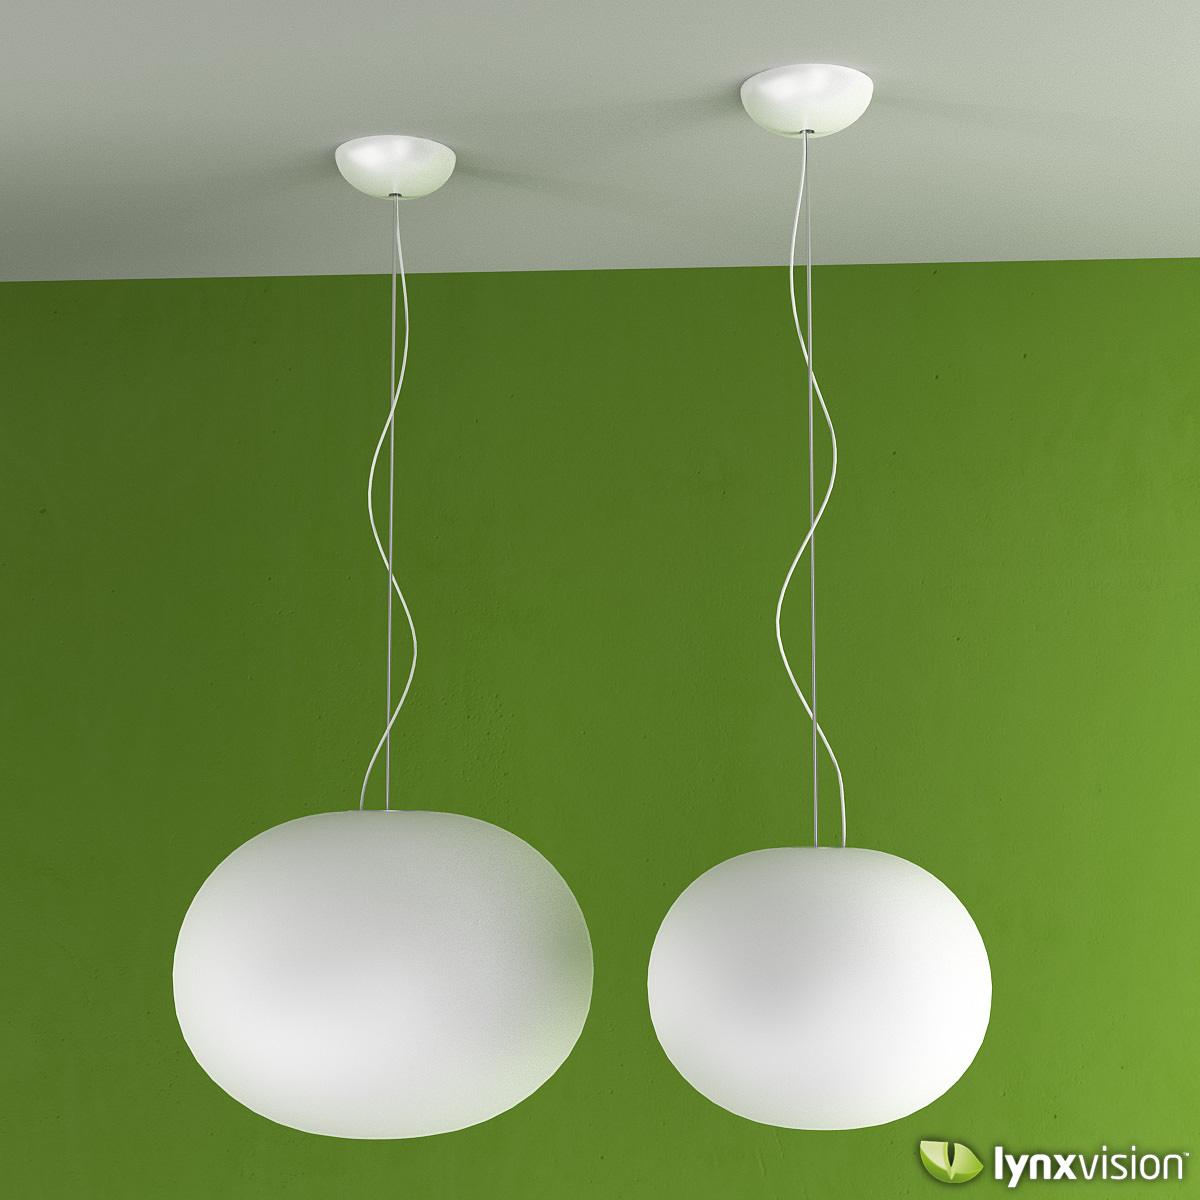 3d glo ball s pendant lamps cgtrader glo ball s pendant lamps 3d model max obj fbx mtl 1 aloadofball Images